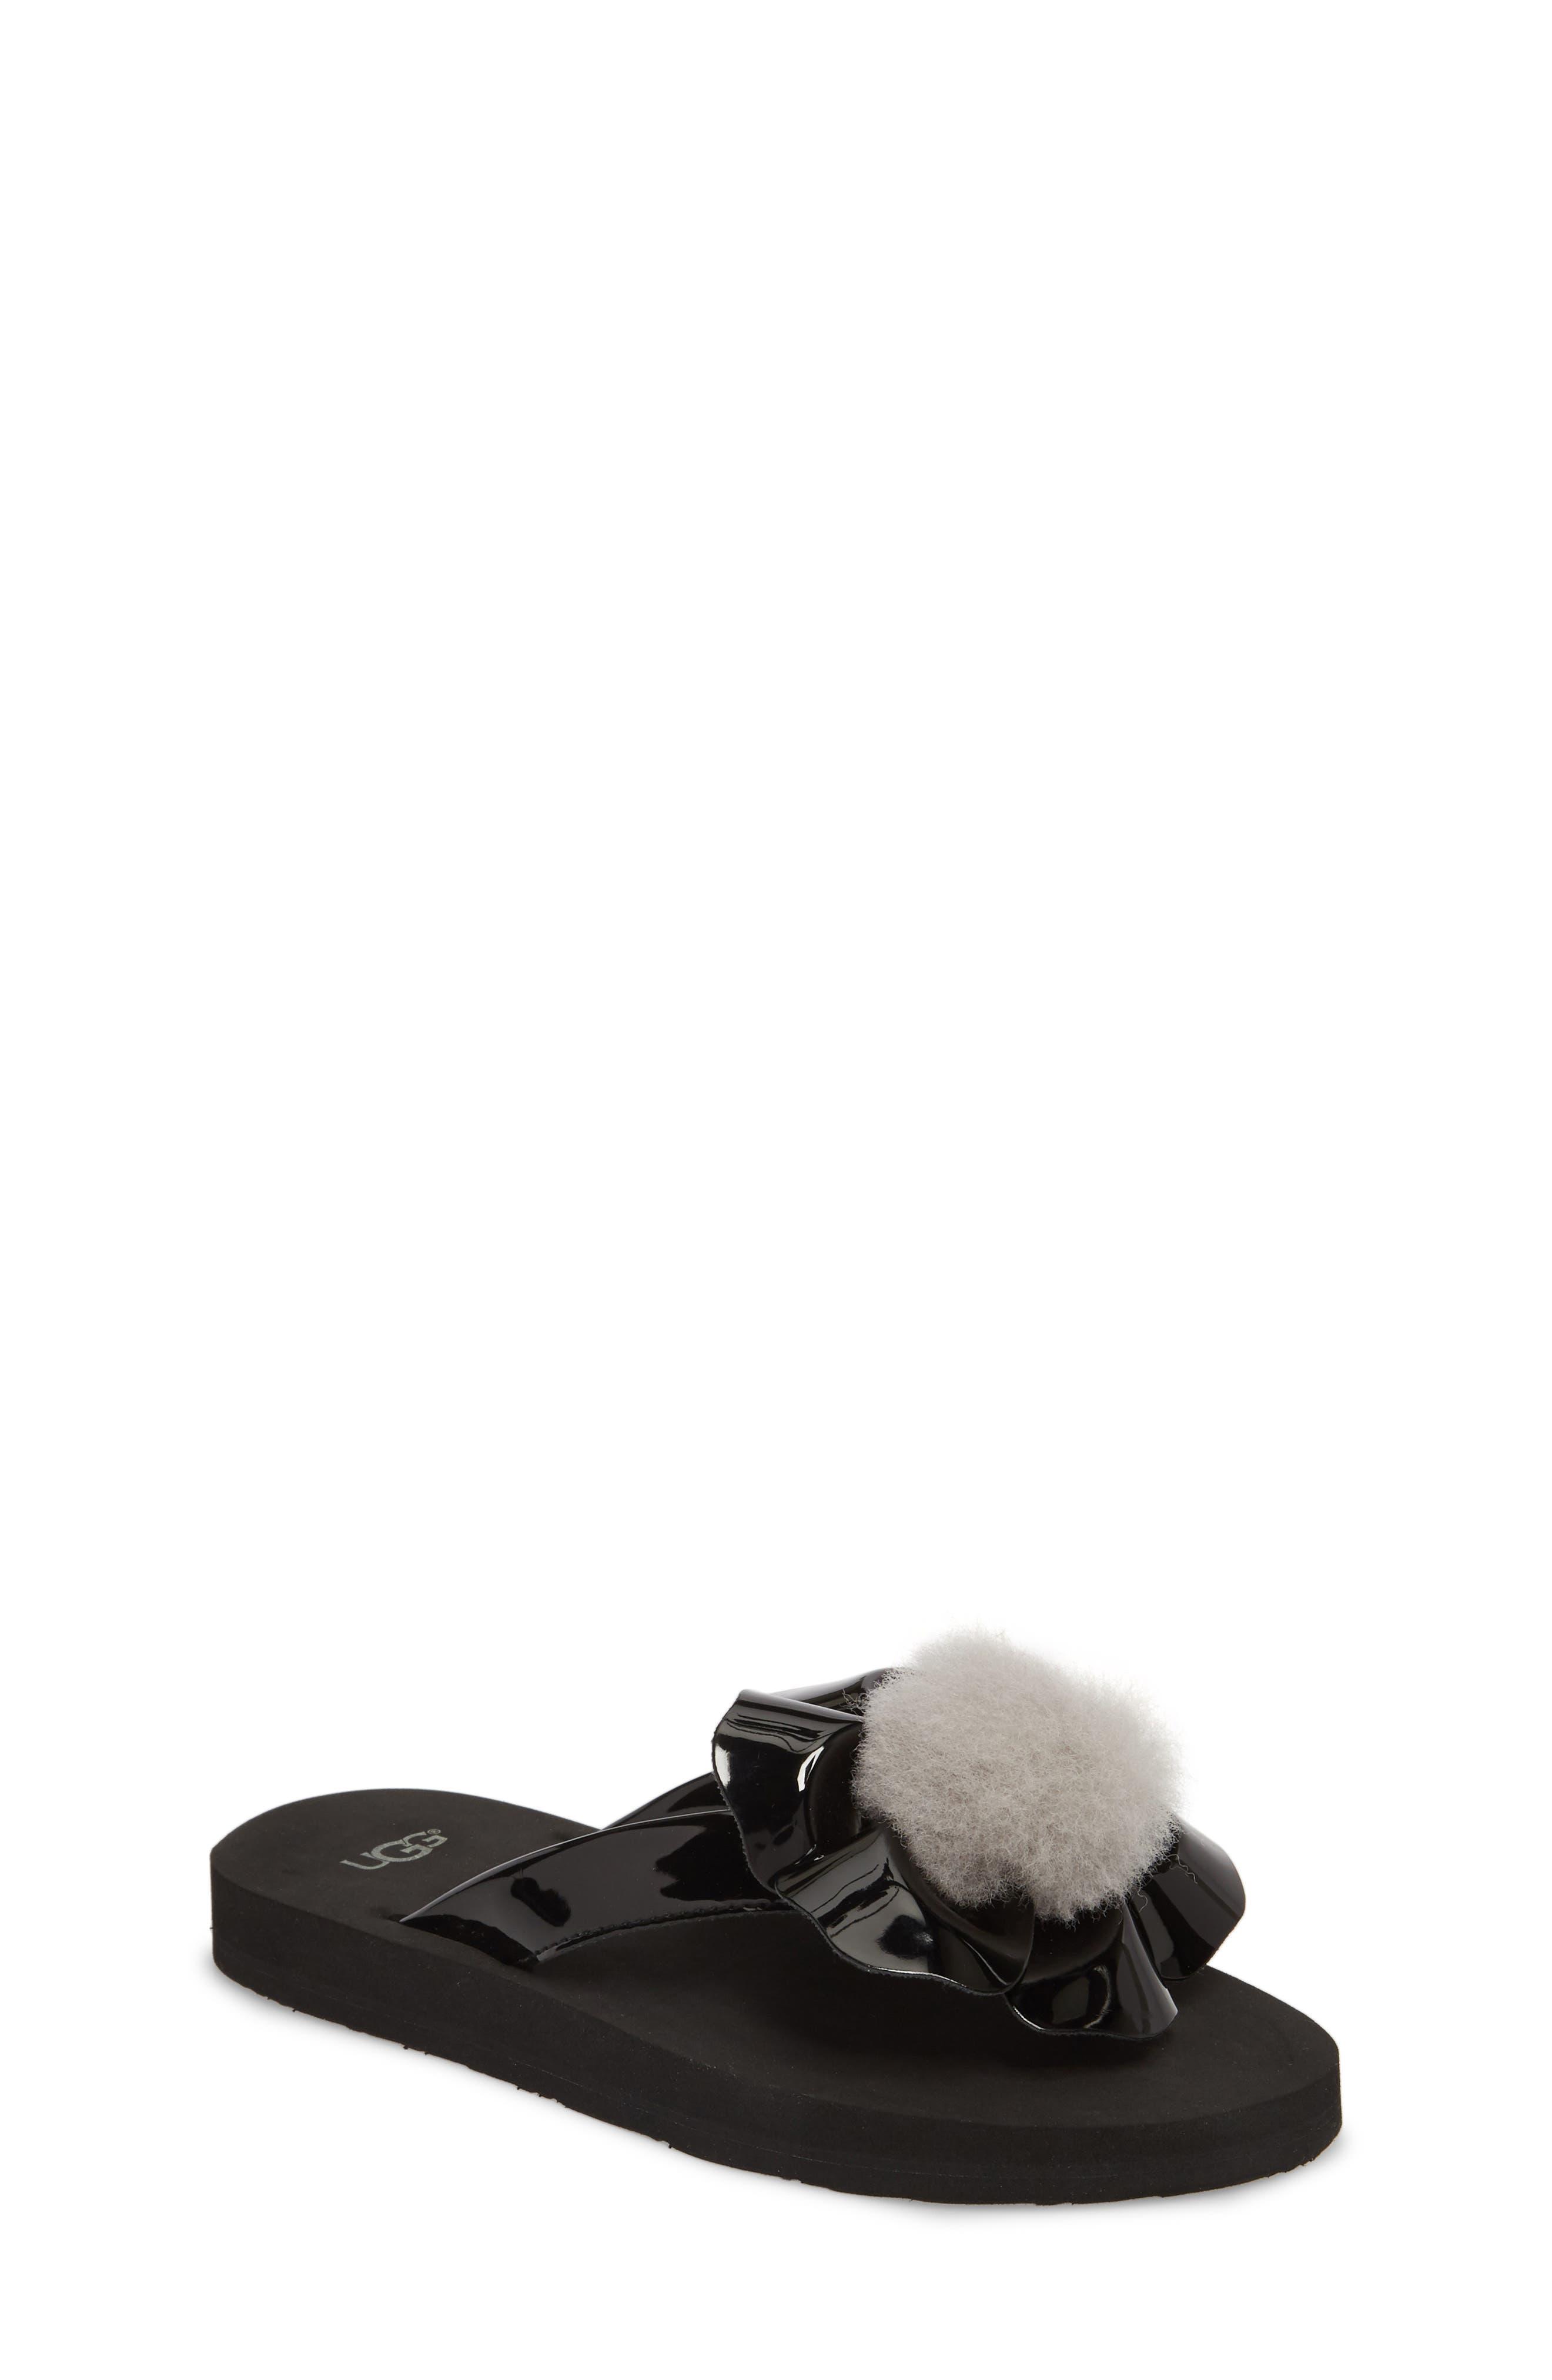 Poppy Genuine Shearling Flip Flop,                         Main,                         color, Black